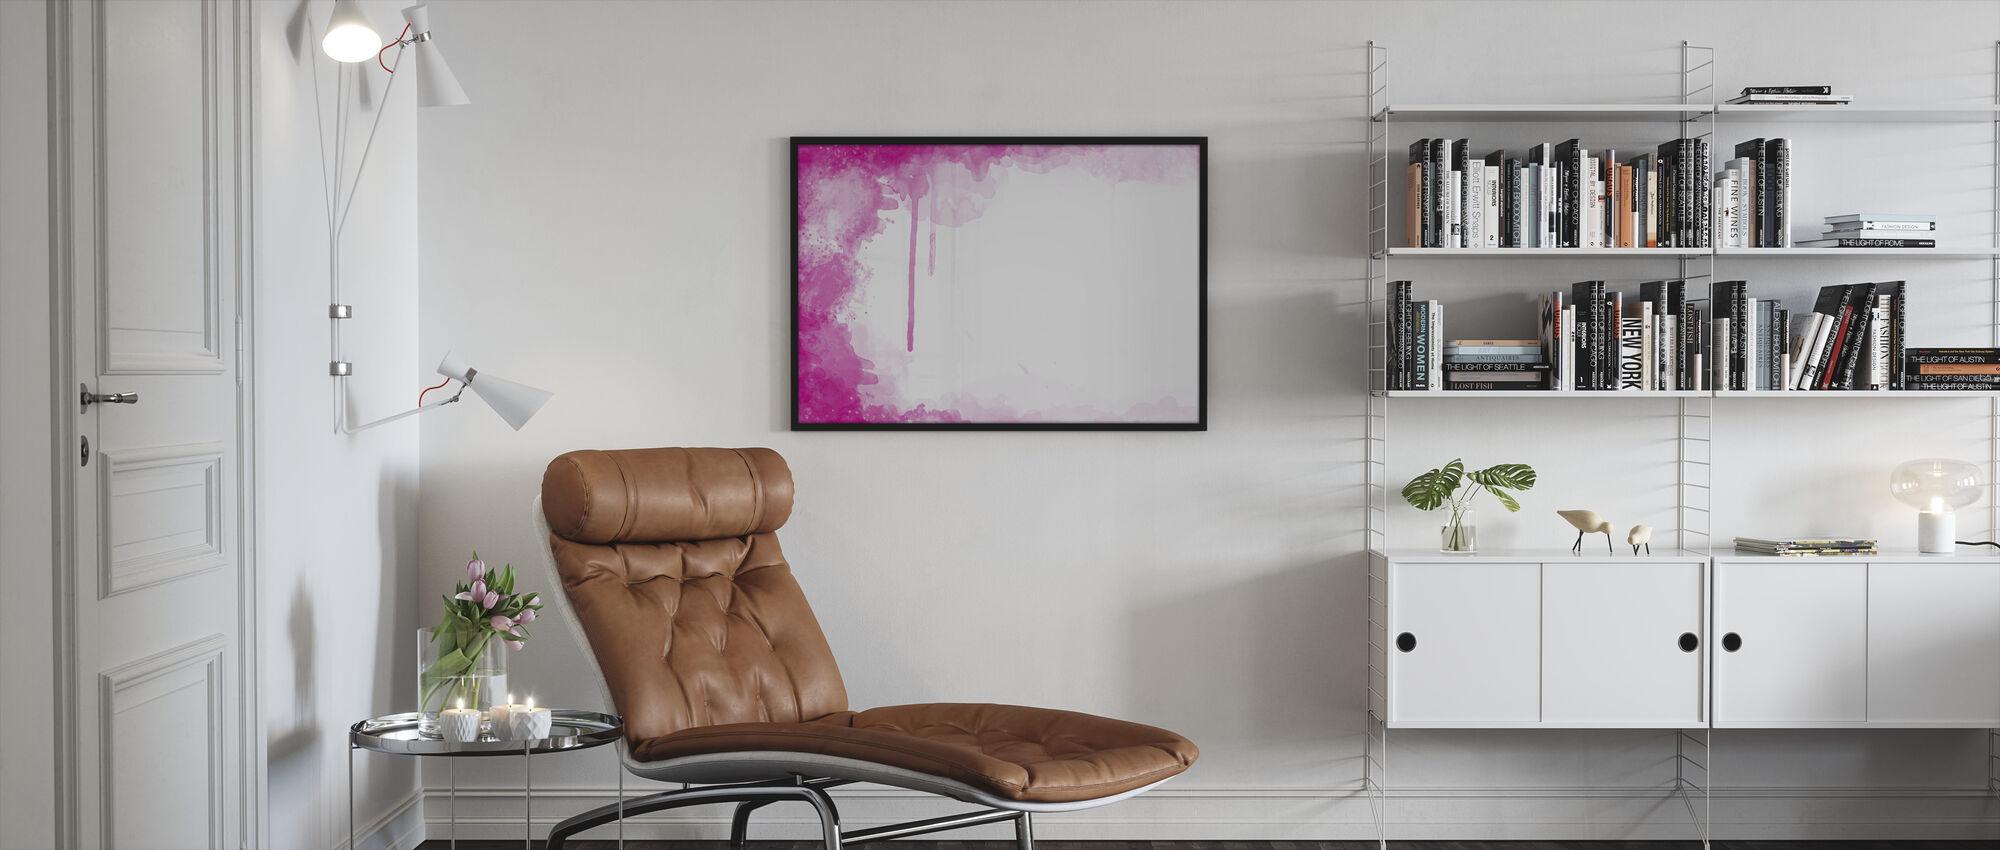 Fuchsia Watercolor - Framed print - Living Room